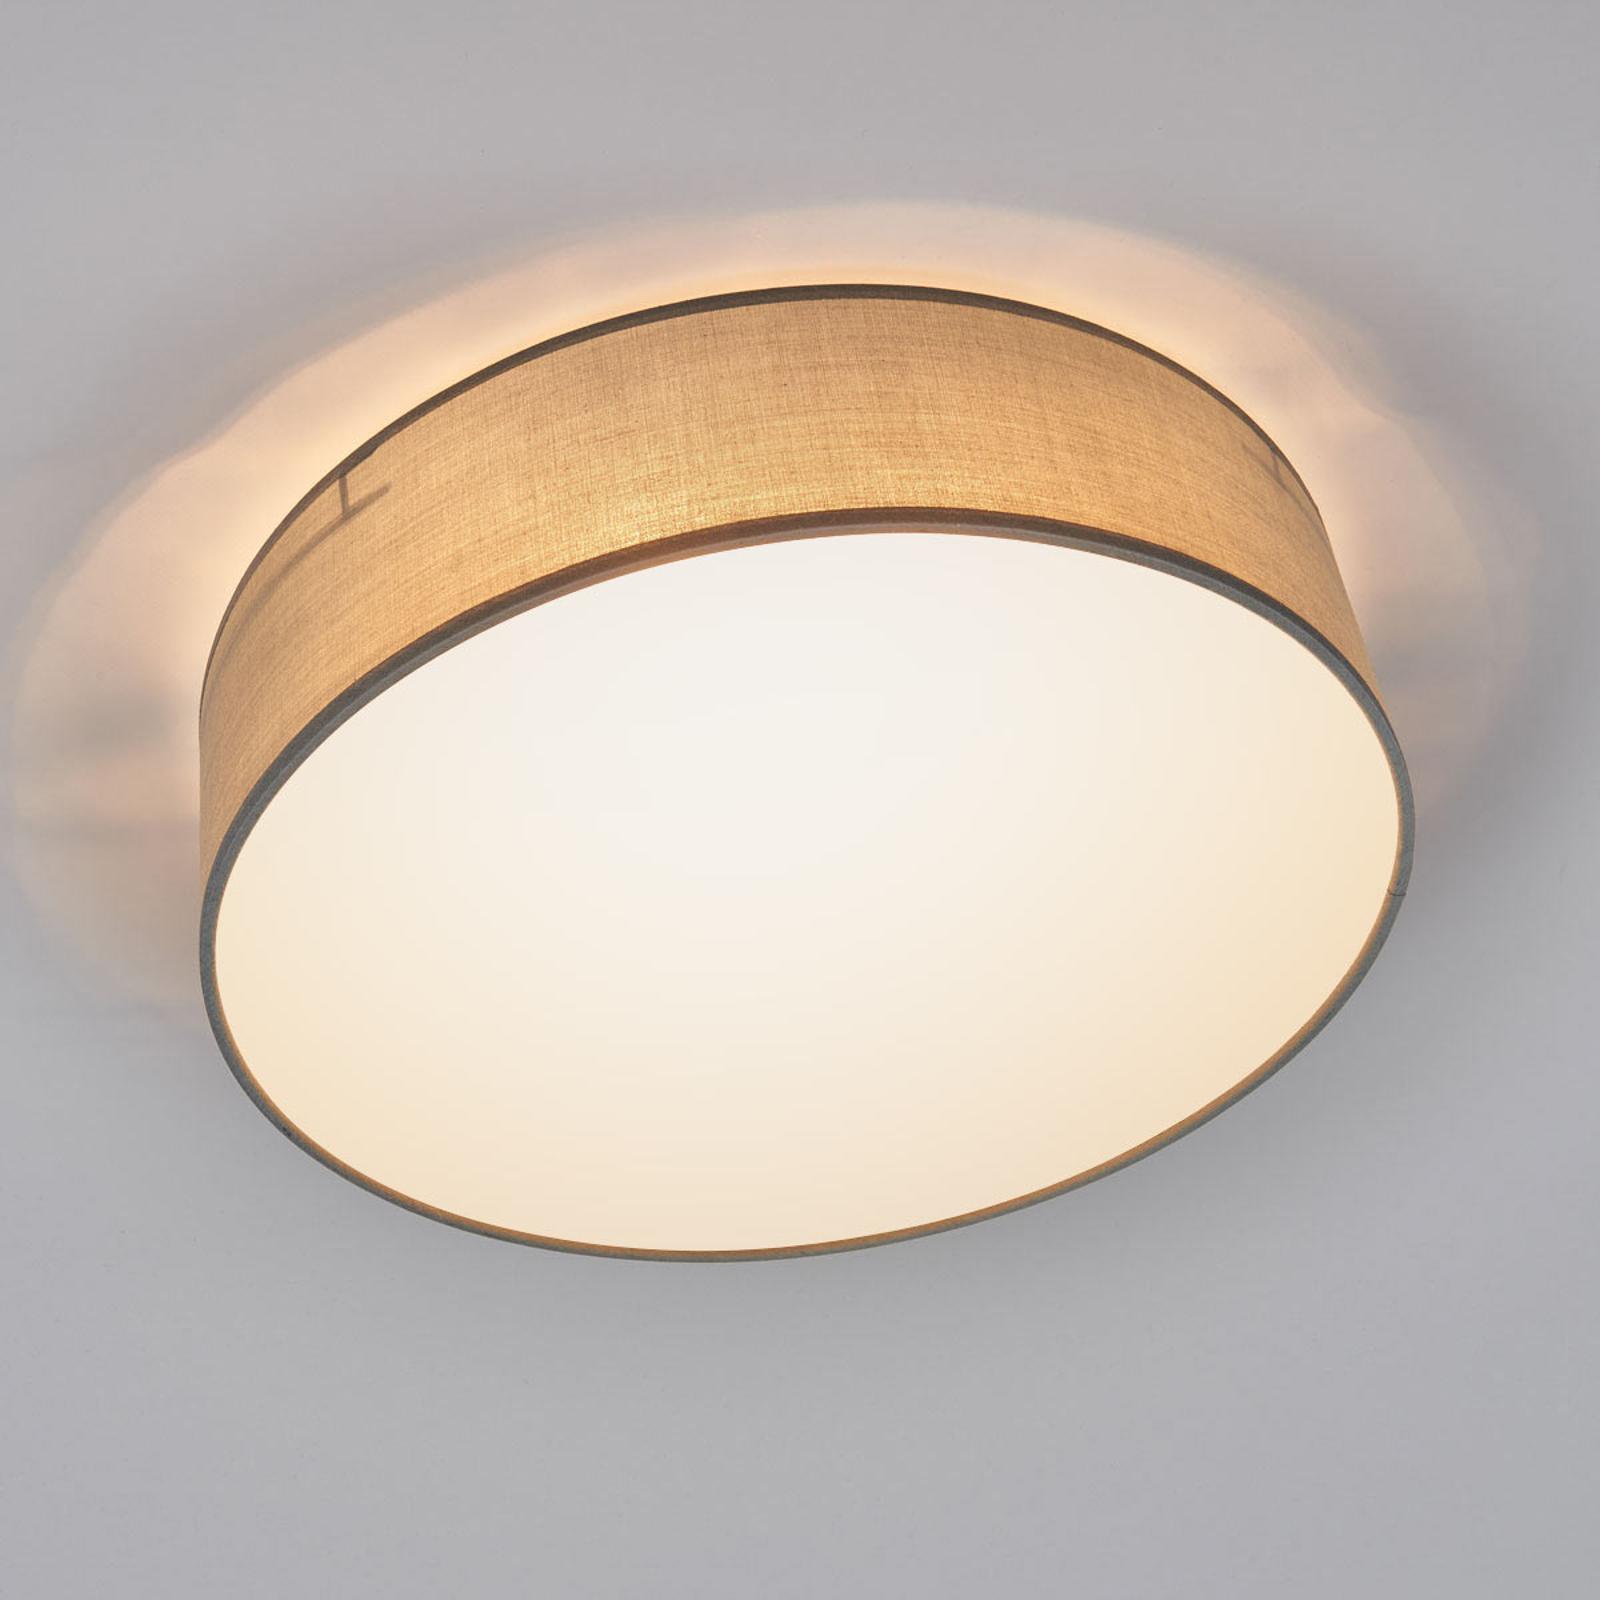 Szara lampa sufitowa CEILING DREAM, 40 cm